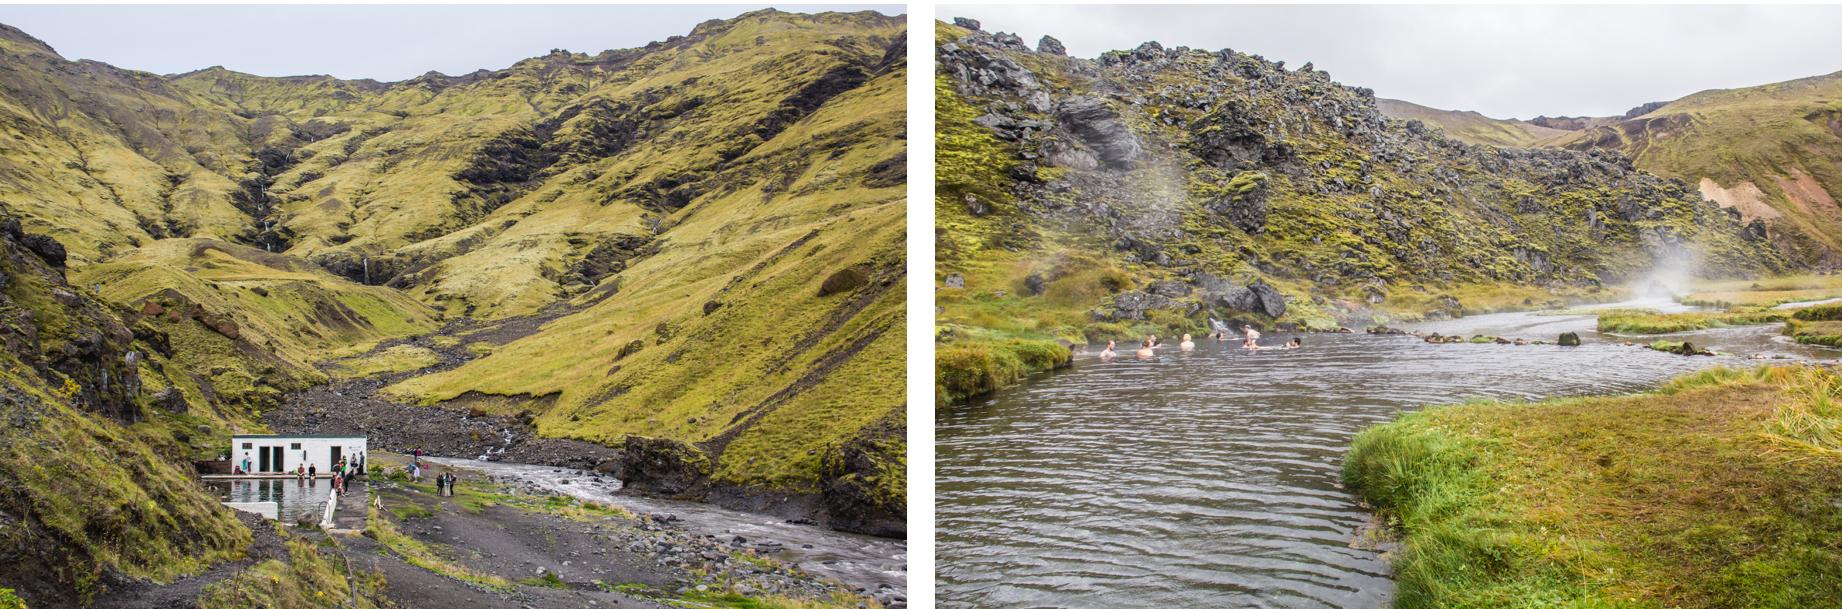 Les hotpot en Islande.